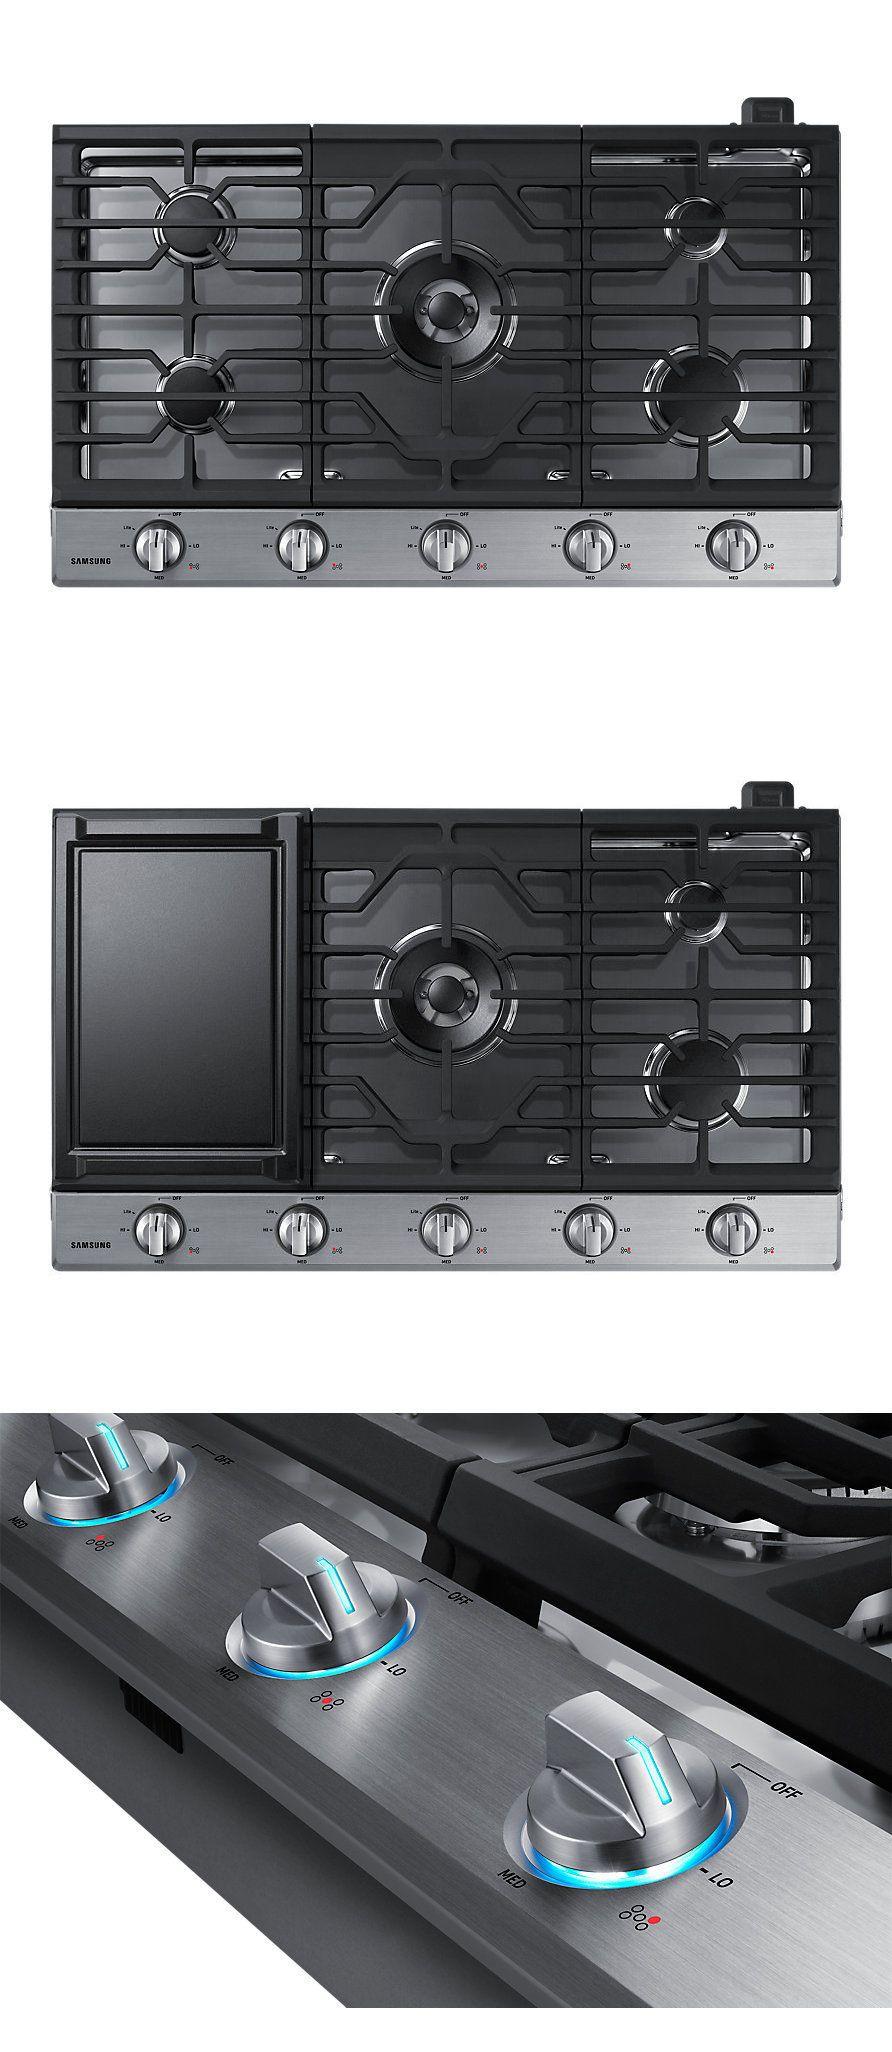 Cooktops 71246 samsung na30k6550ts aa 30 gas cooktop w